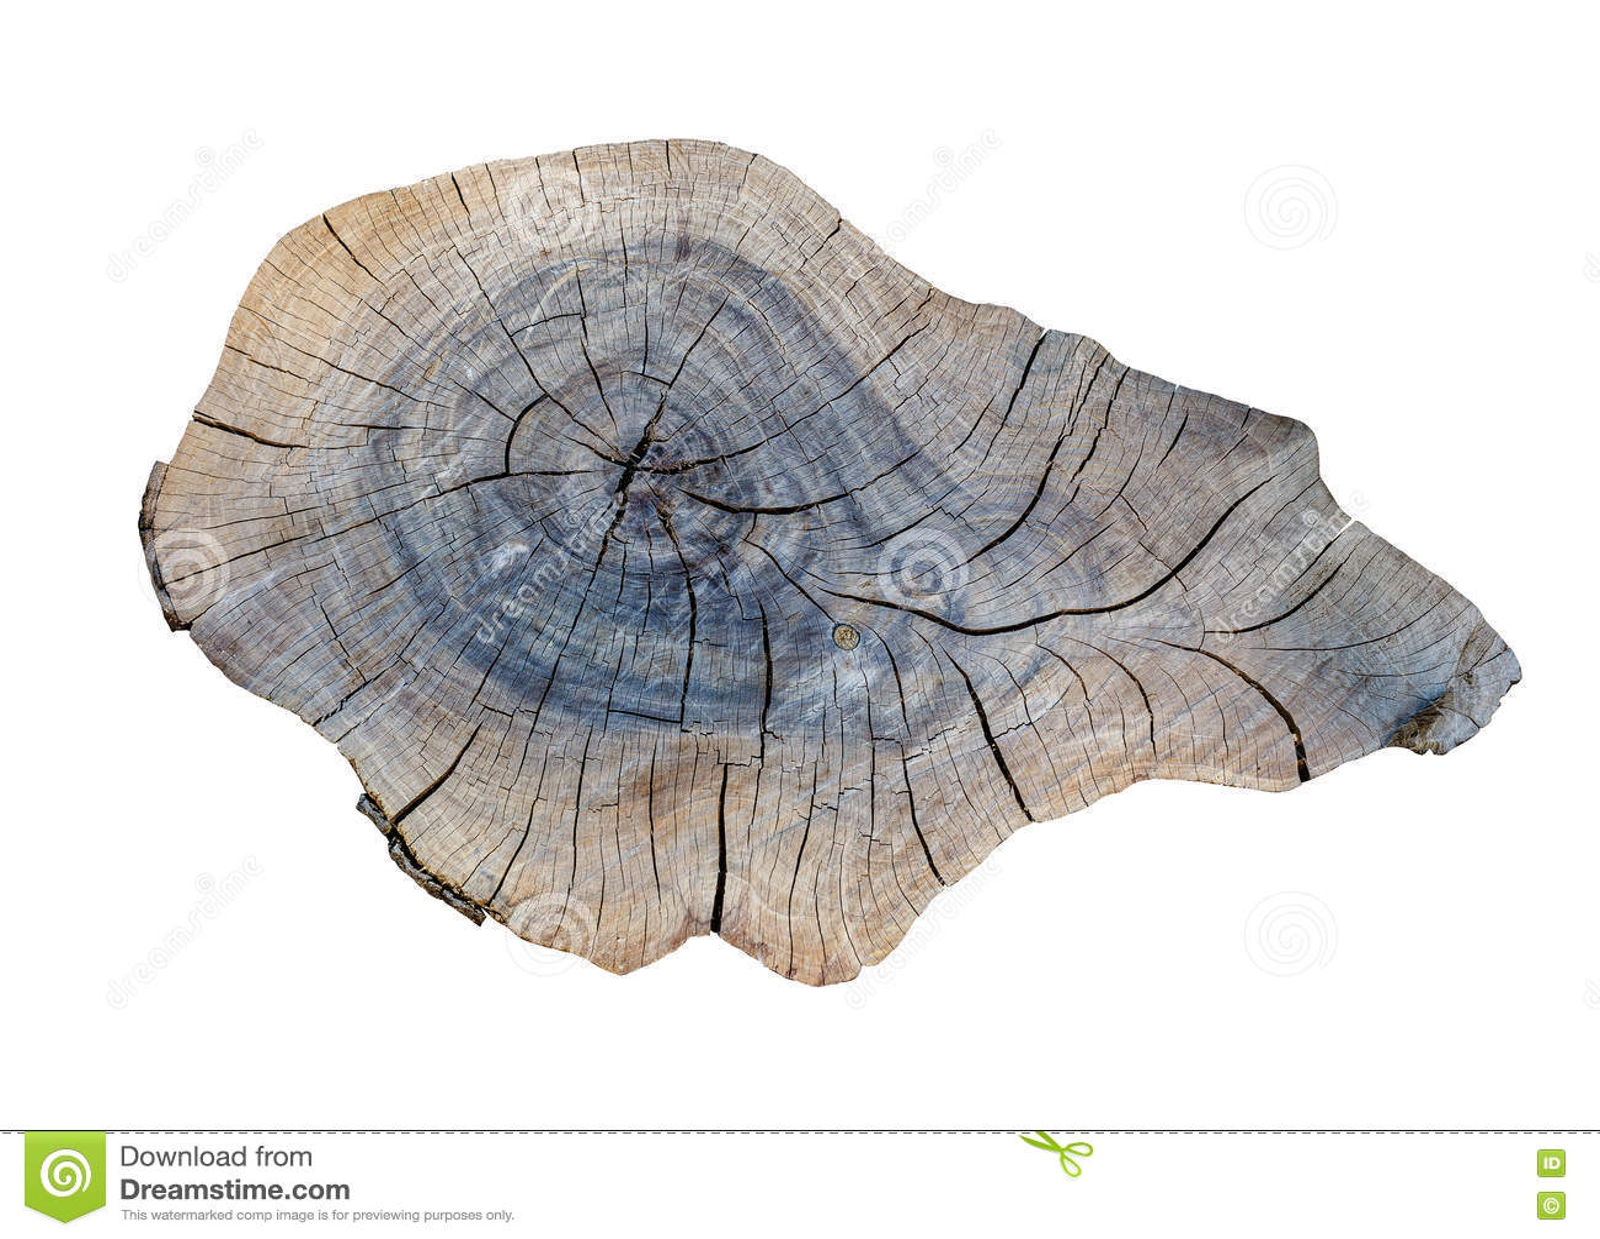 Cracking teak tree slice